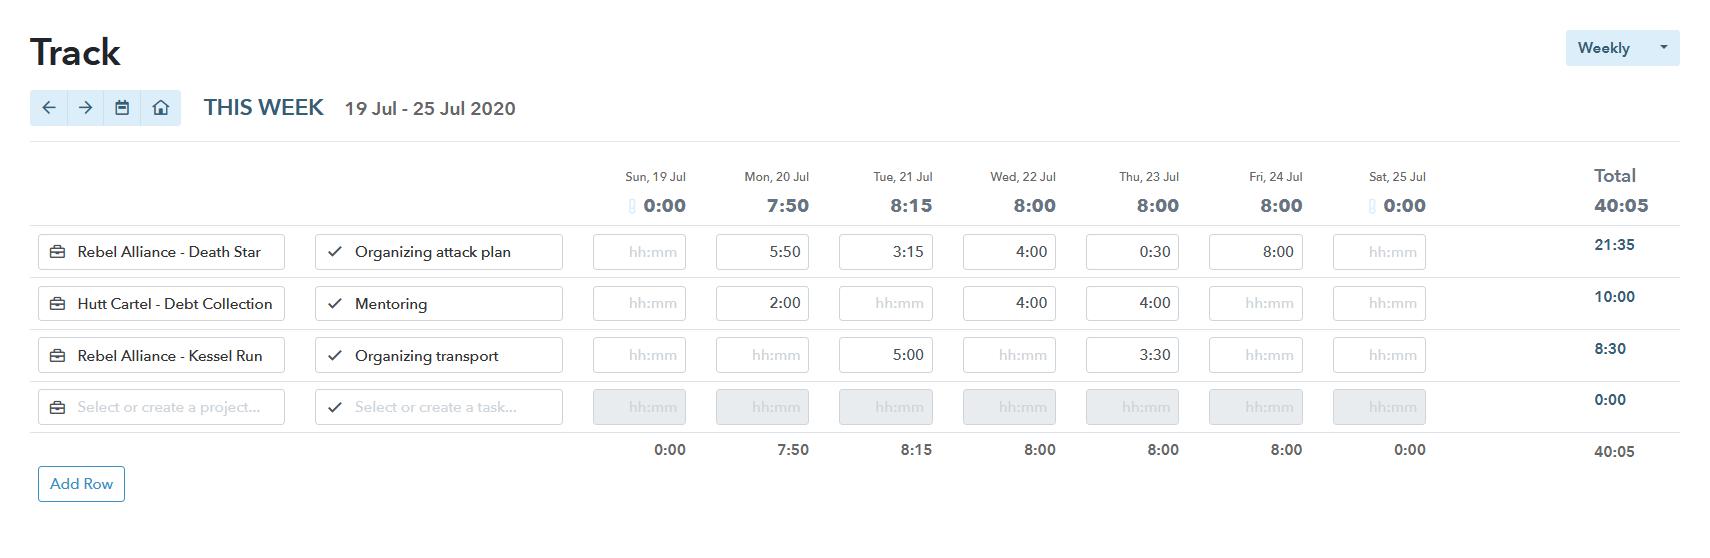 Timesheet app screenshot of My Hours